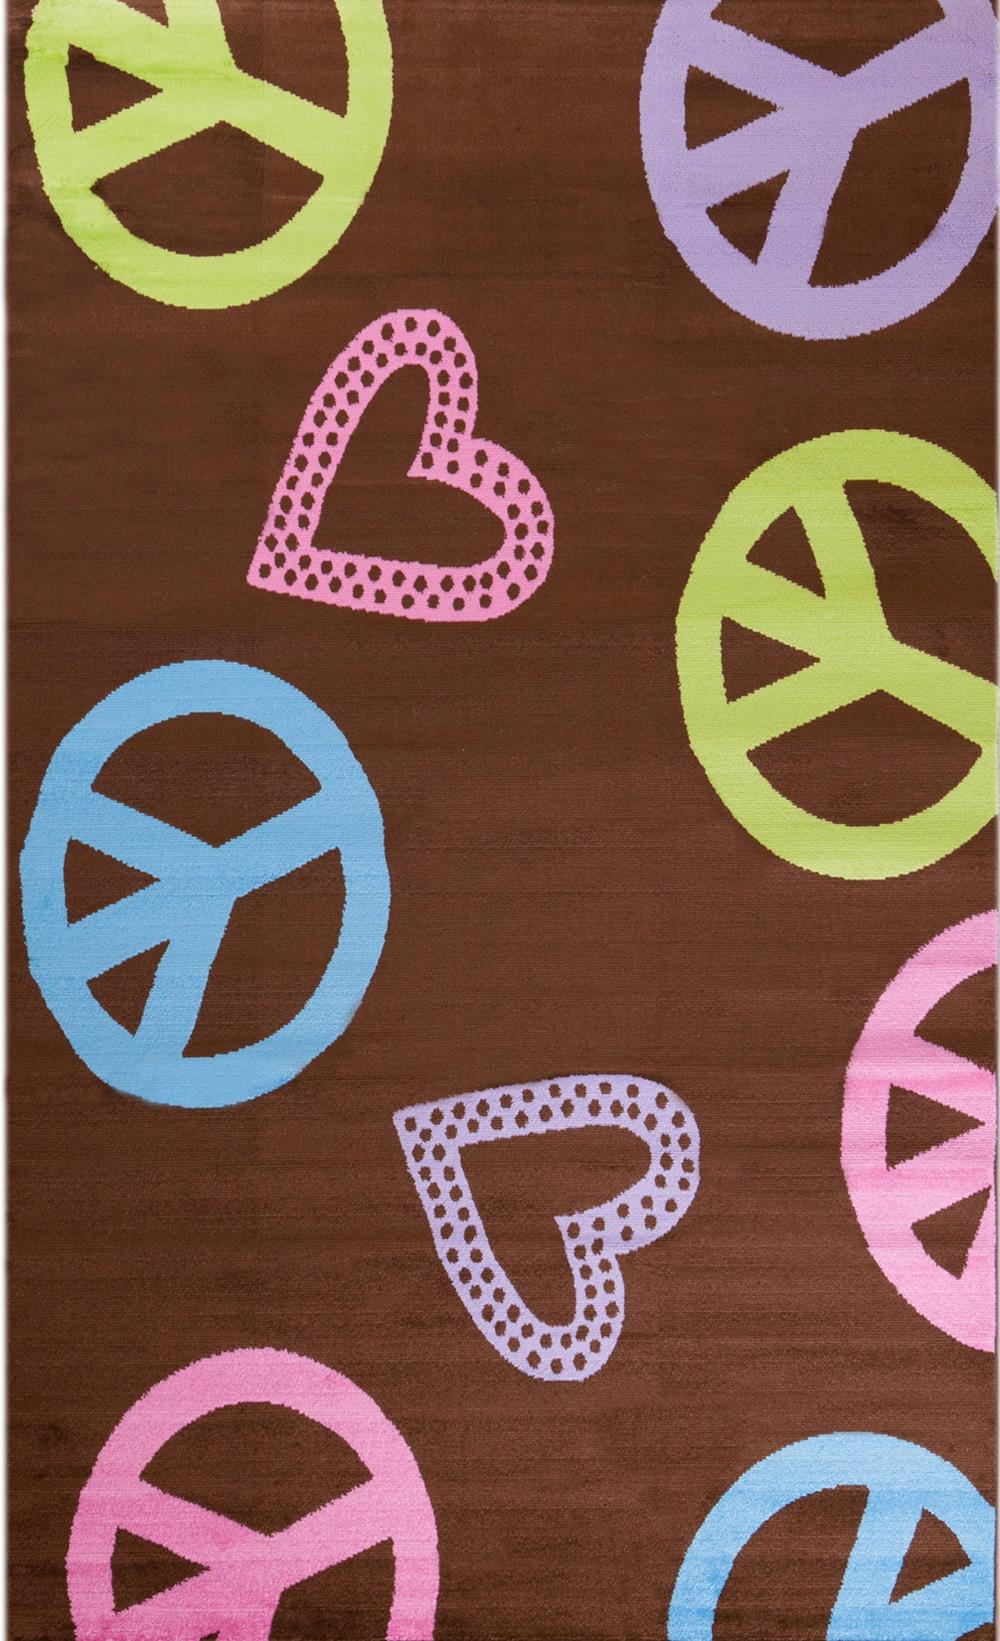 Concord Global Alisa PEACE AND POLKA HEARTS BROWN Rug